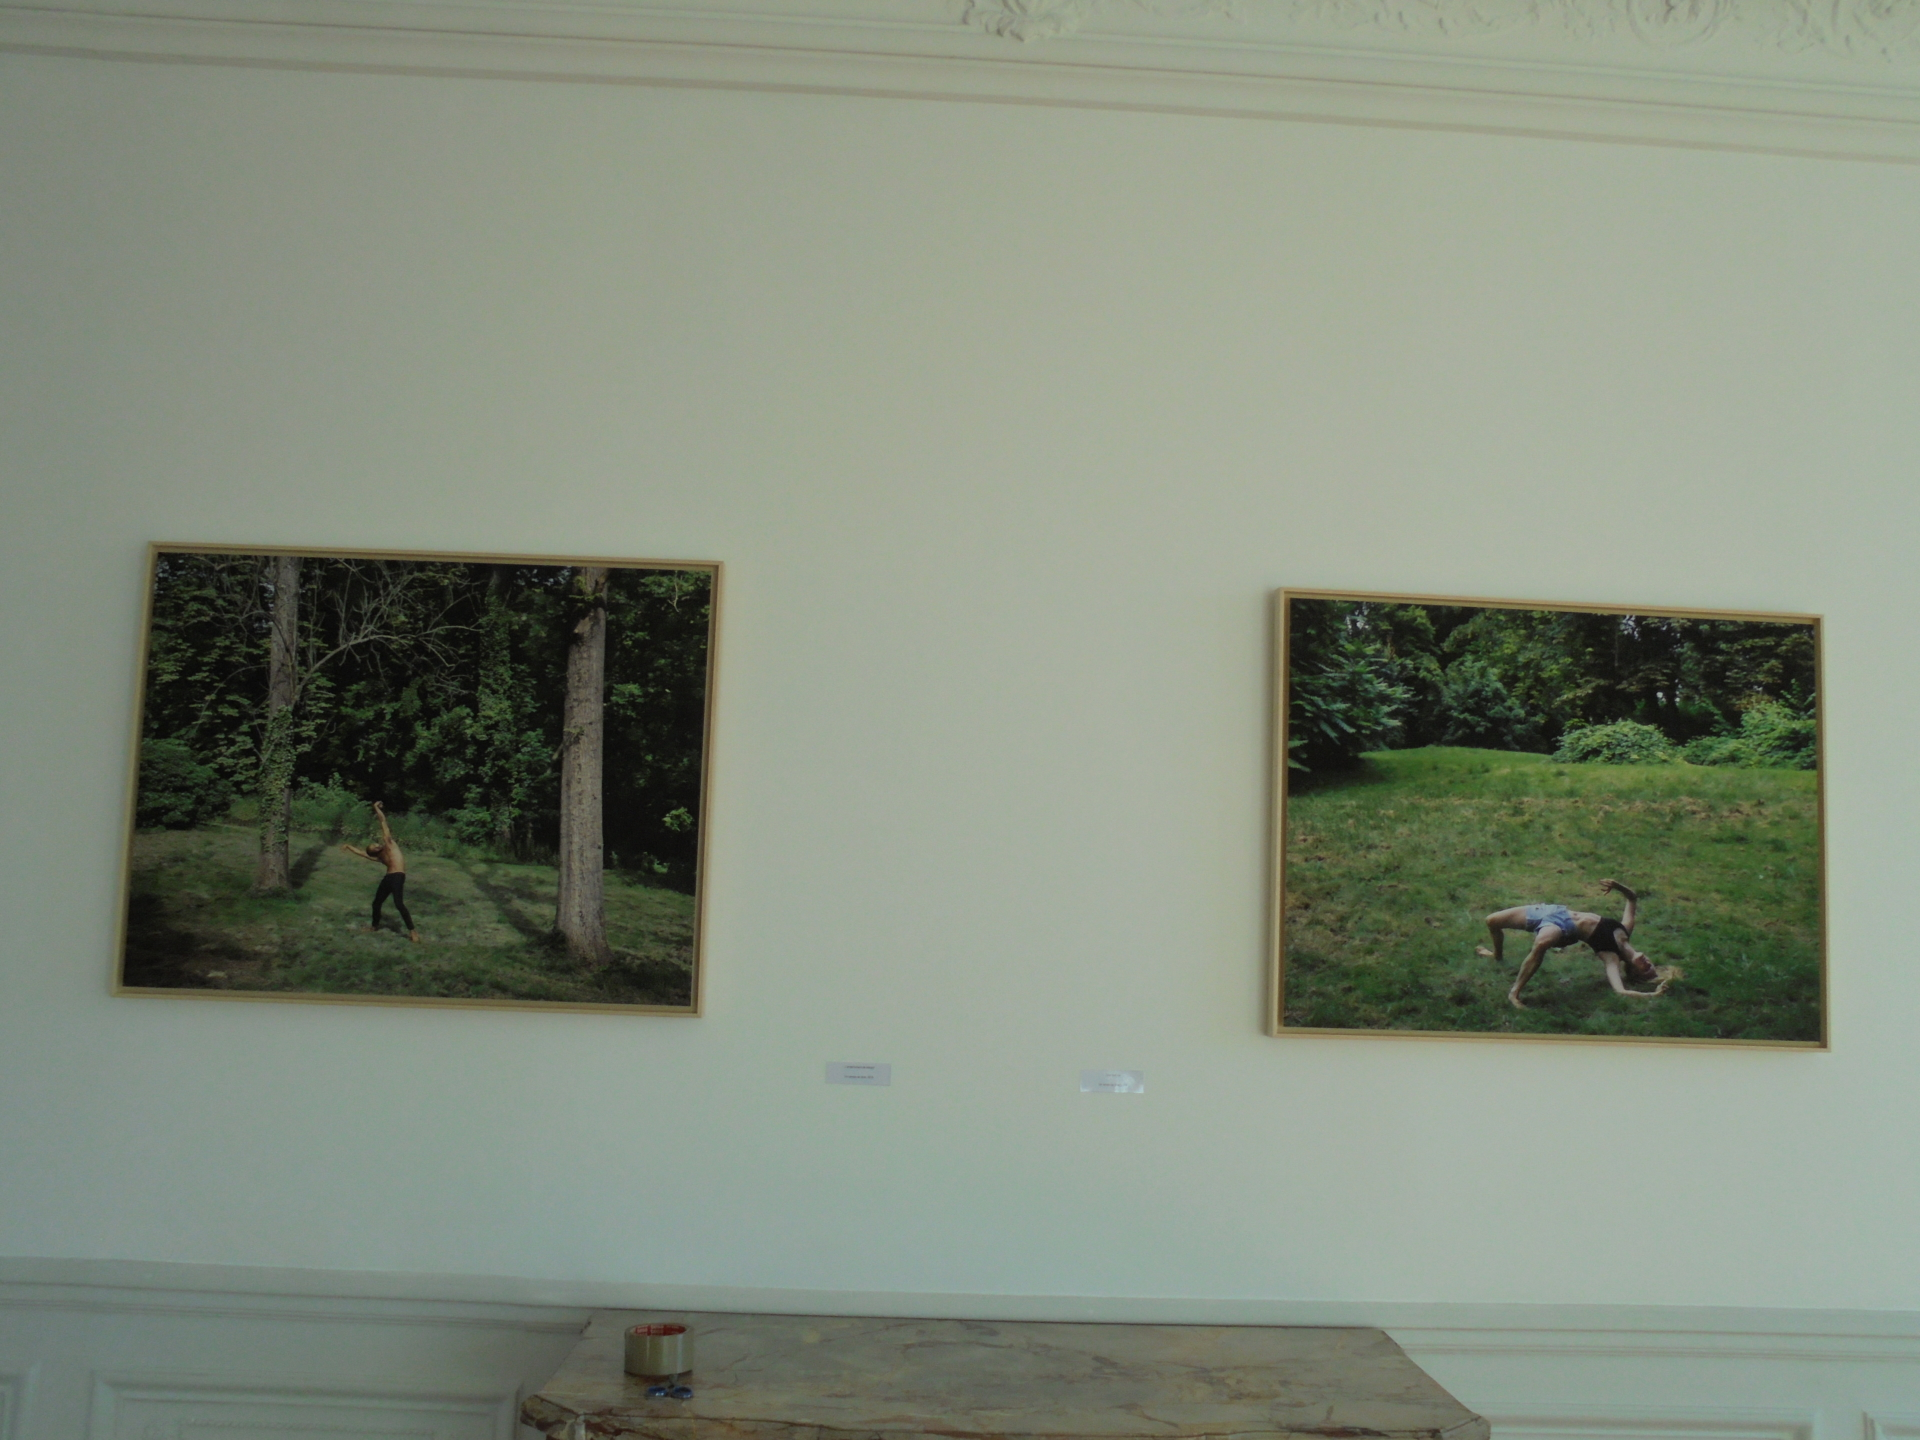 Vues de l'exposition G. KORGANOW (5)